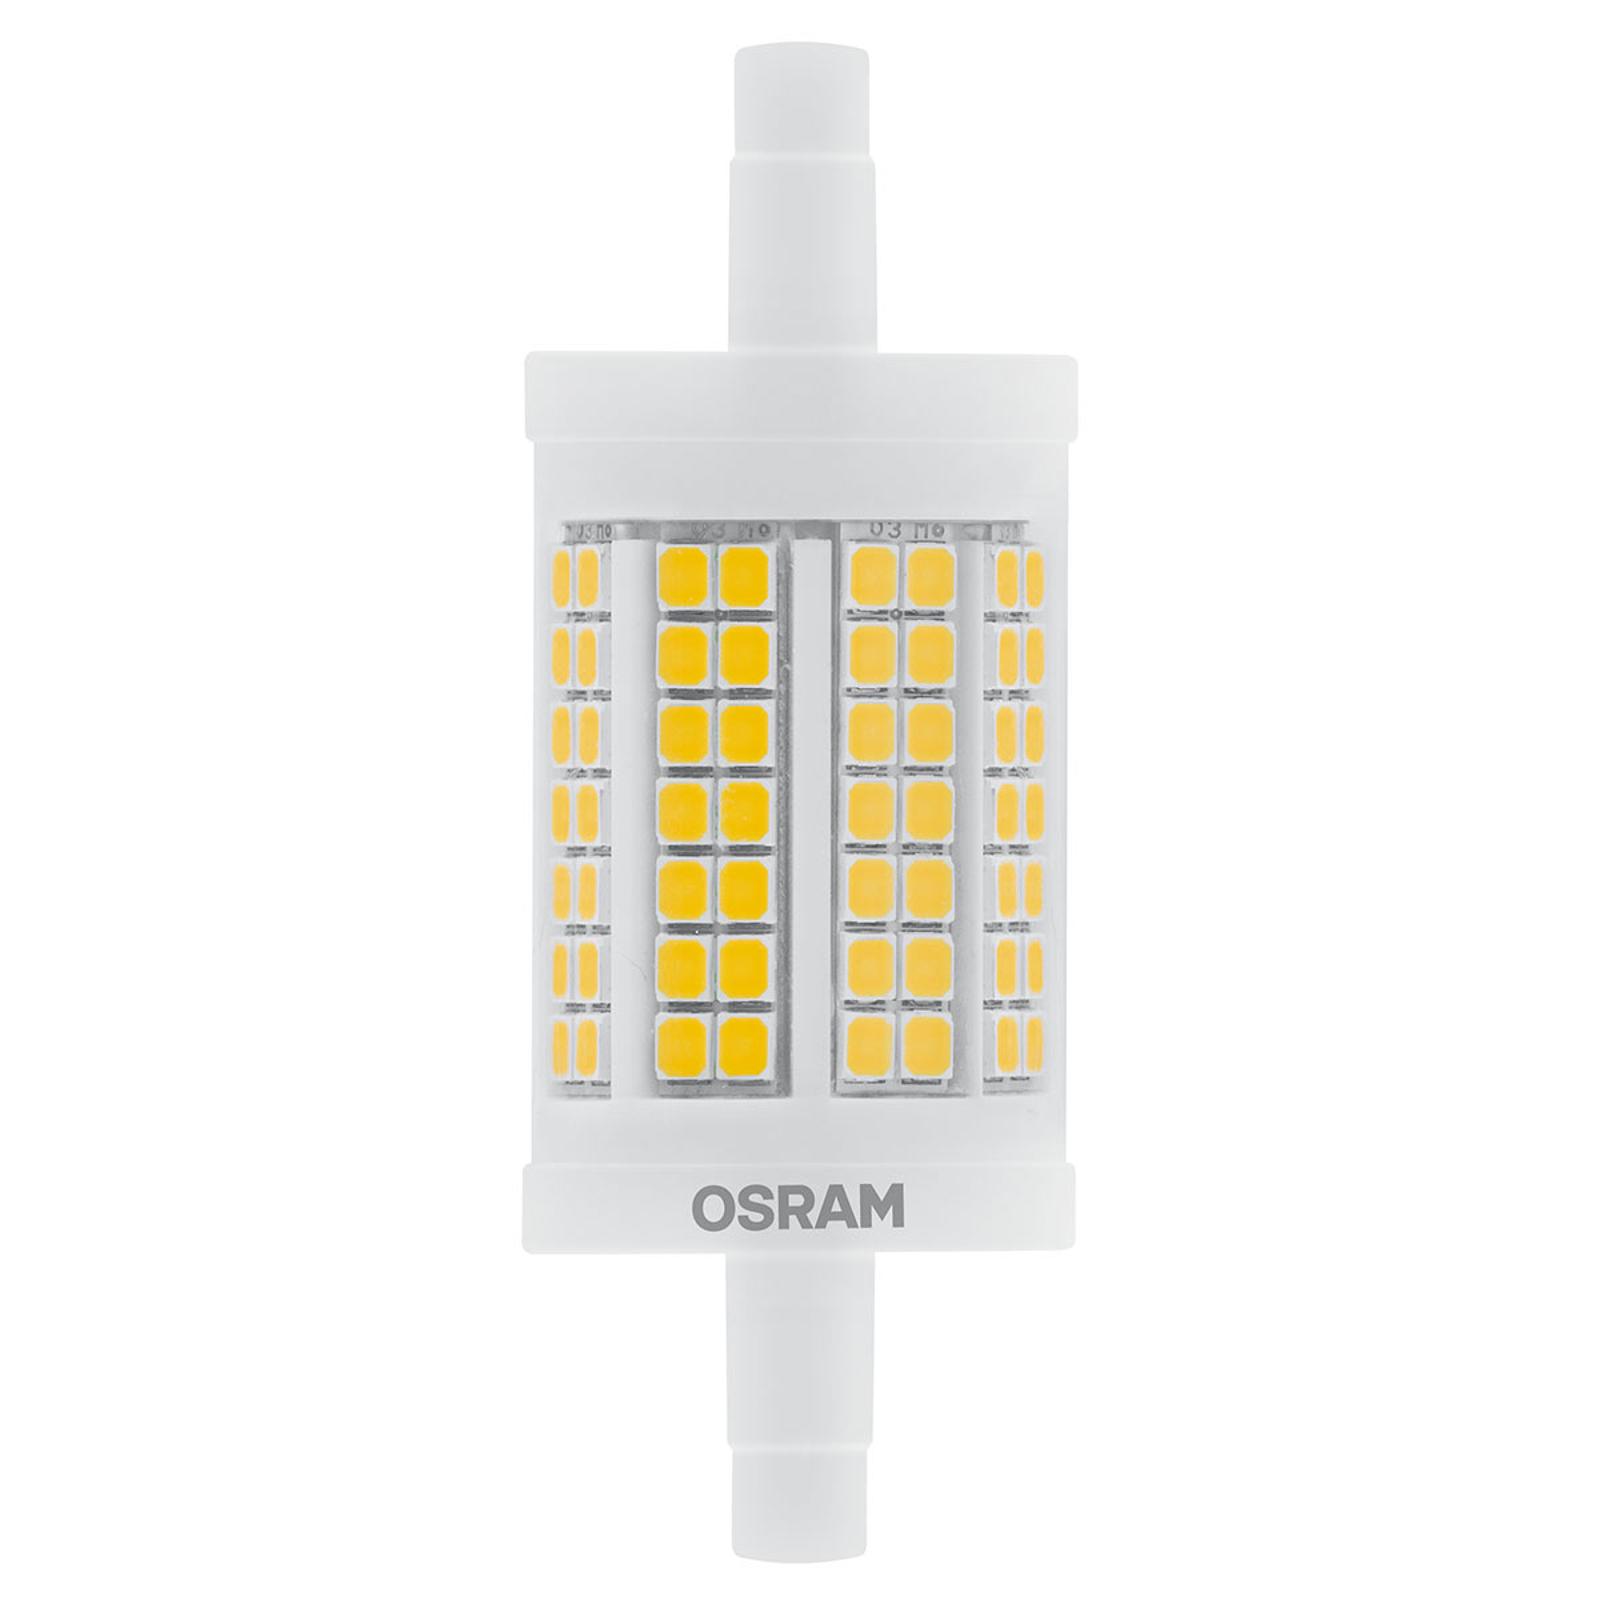 OSRAM LED tubolare R7s 11,5W bianco caldo 1.521 lm